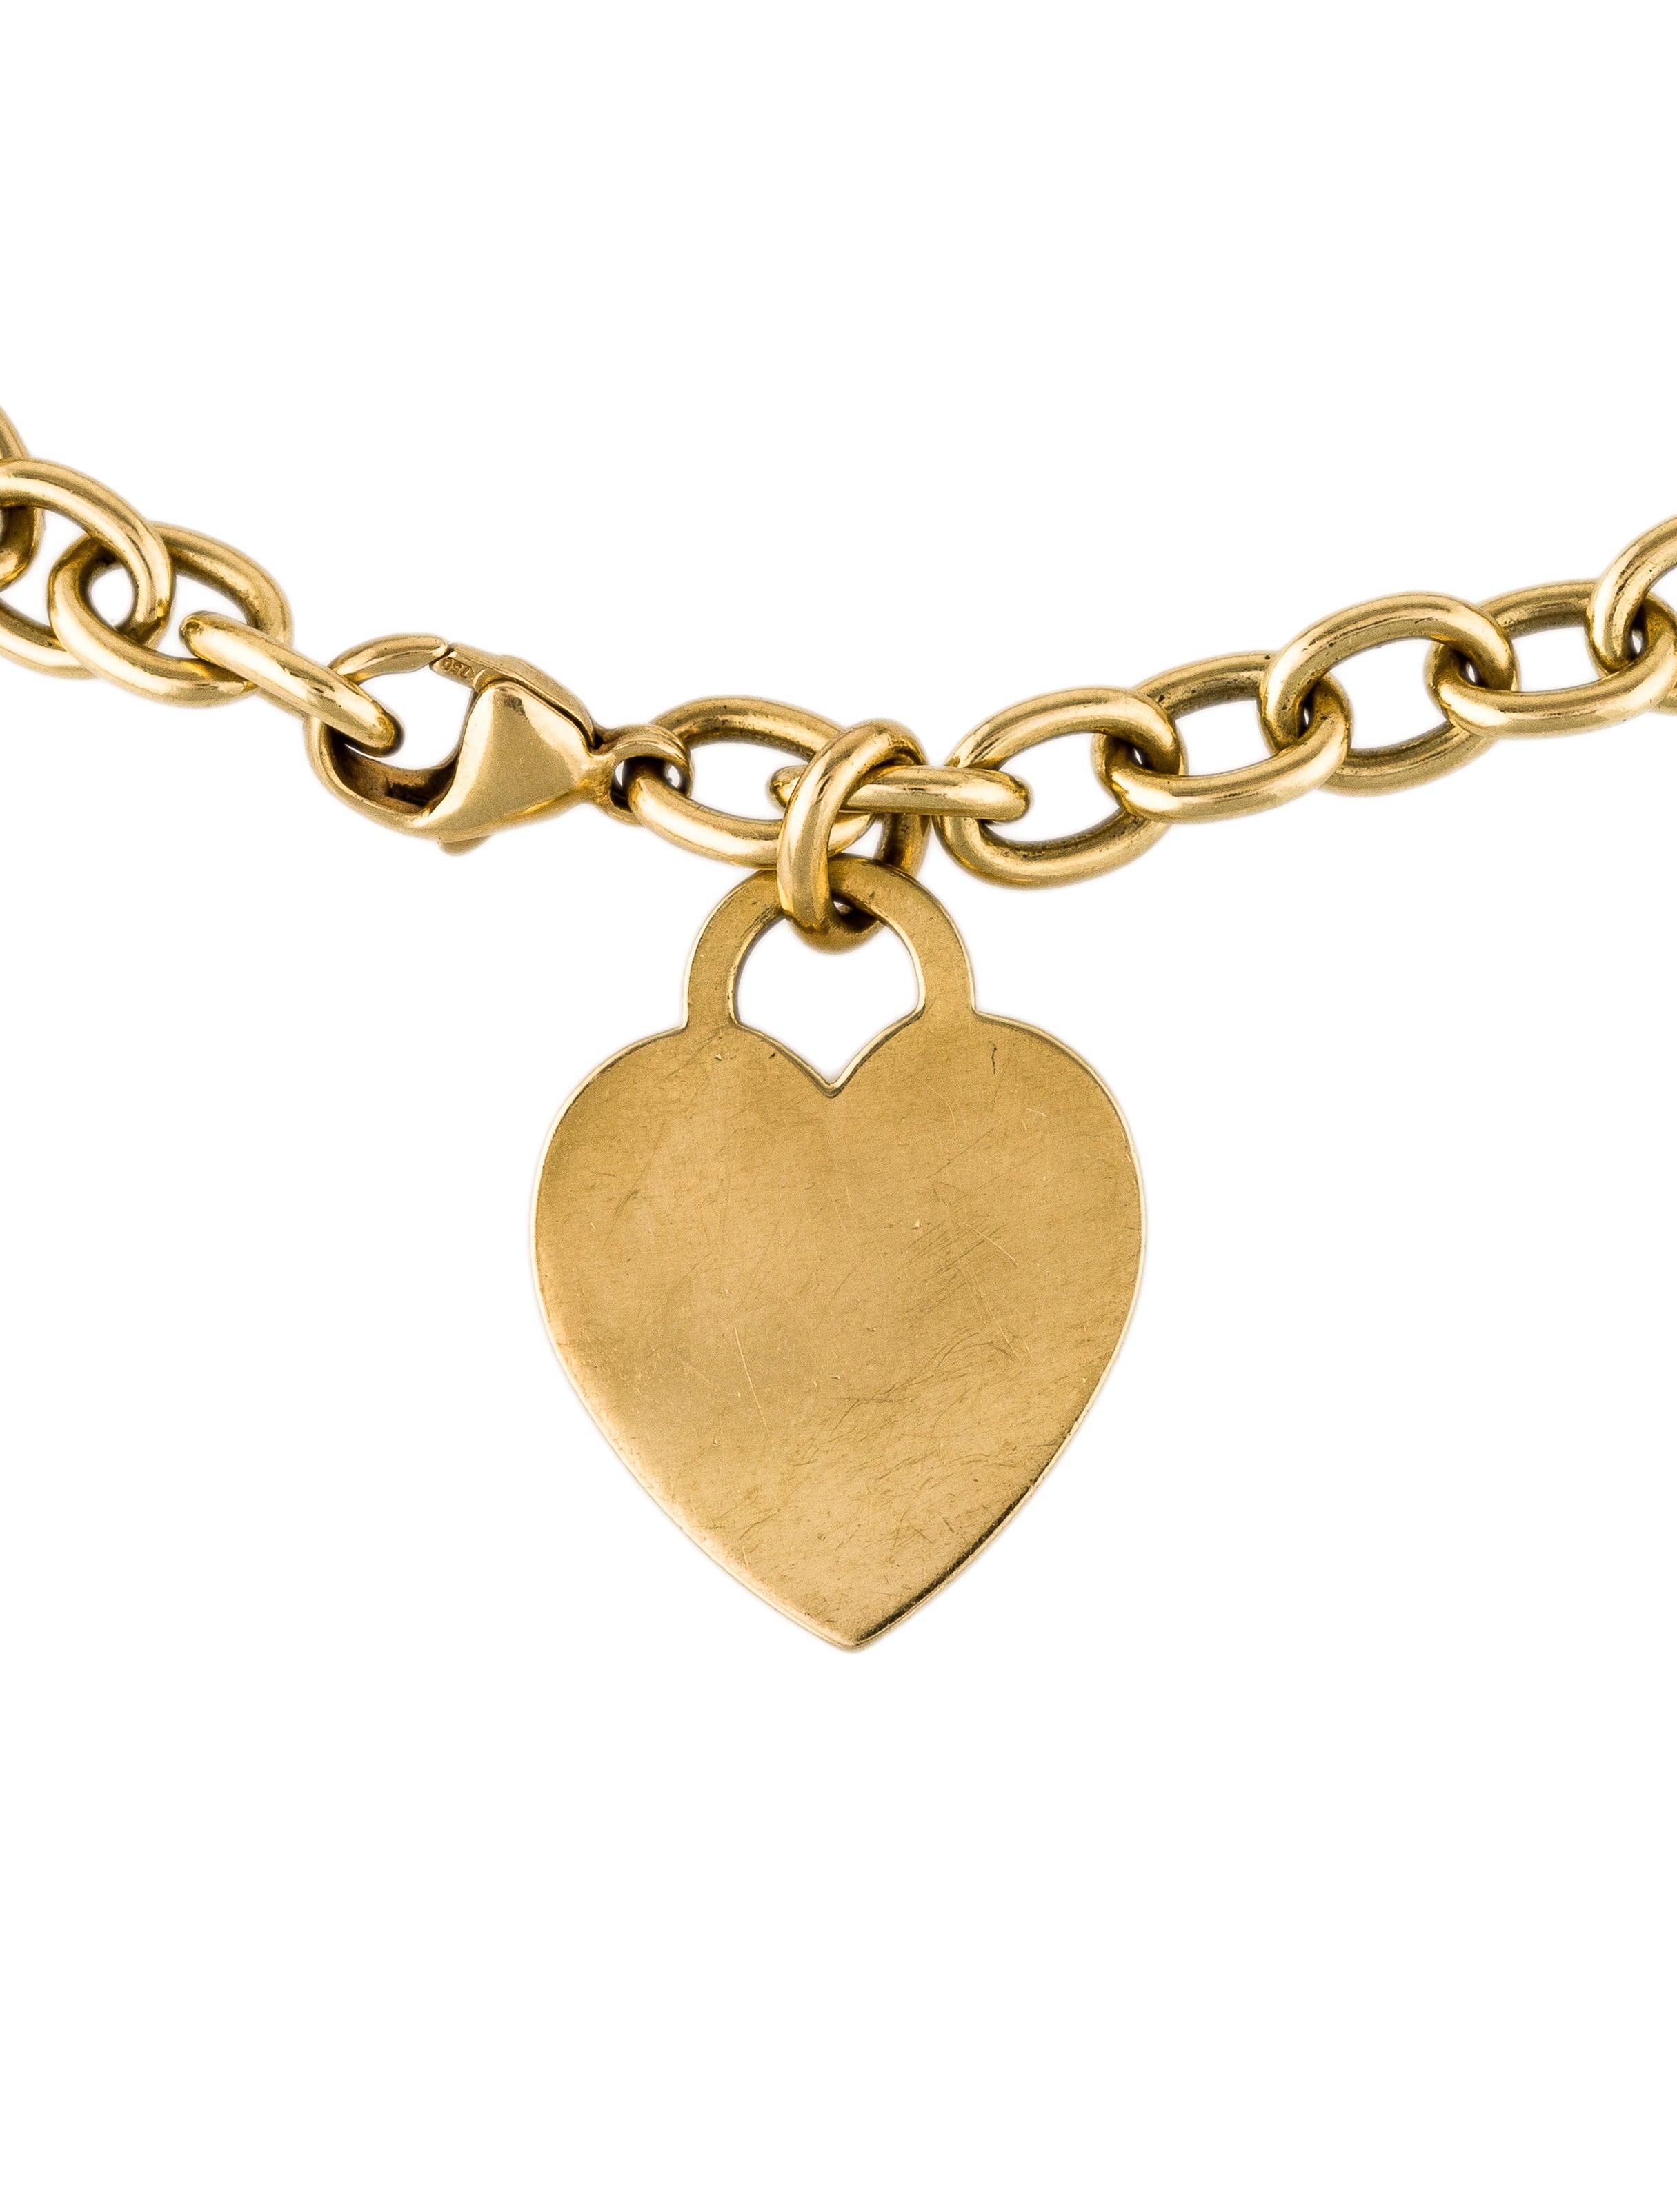 Tiffany & Co. 18K Heart Tag Charm Bracelet - Bracelets - TIF57939   The RealReal